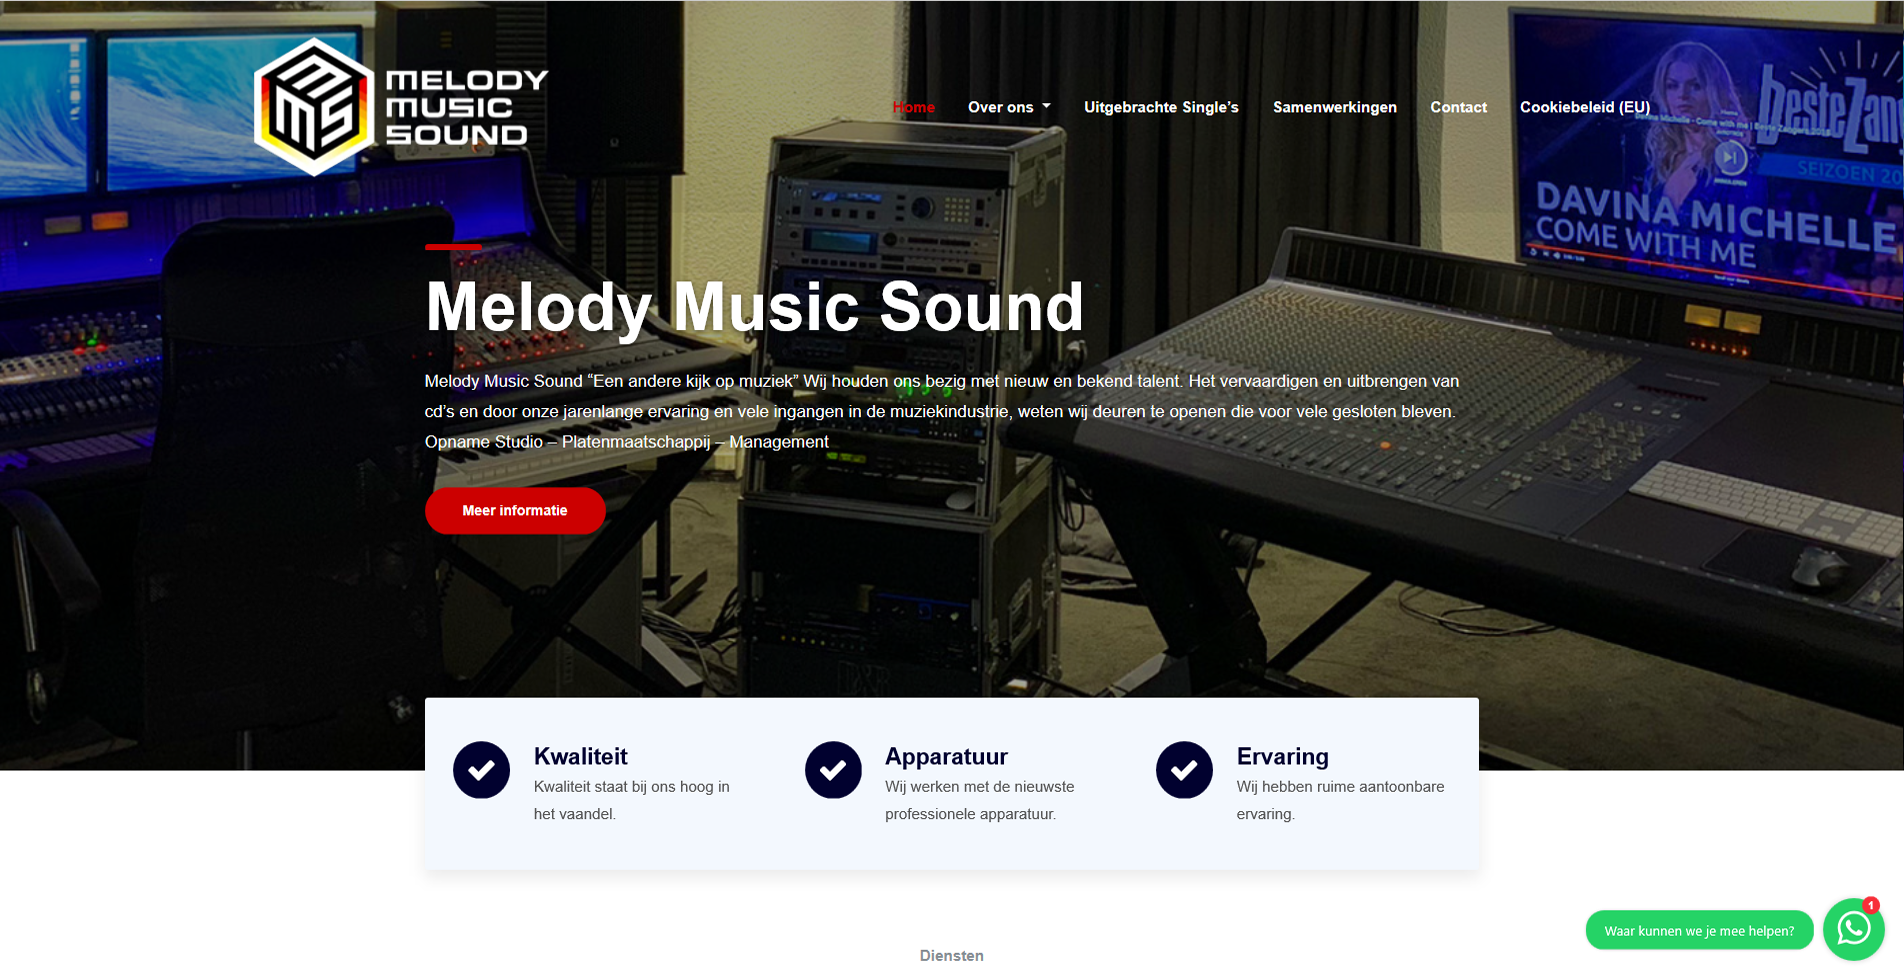 Melody Music Sound